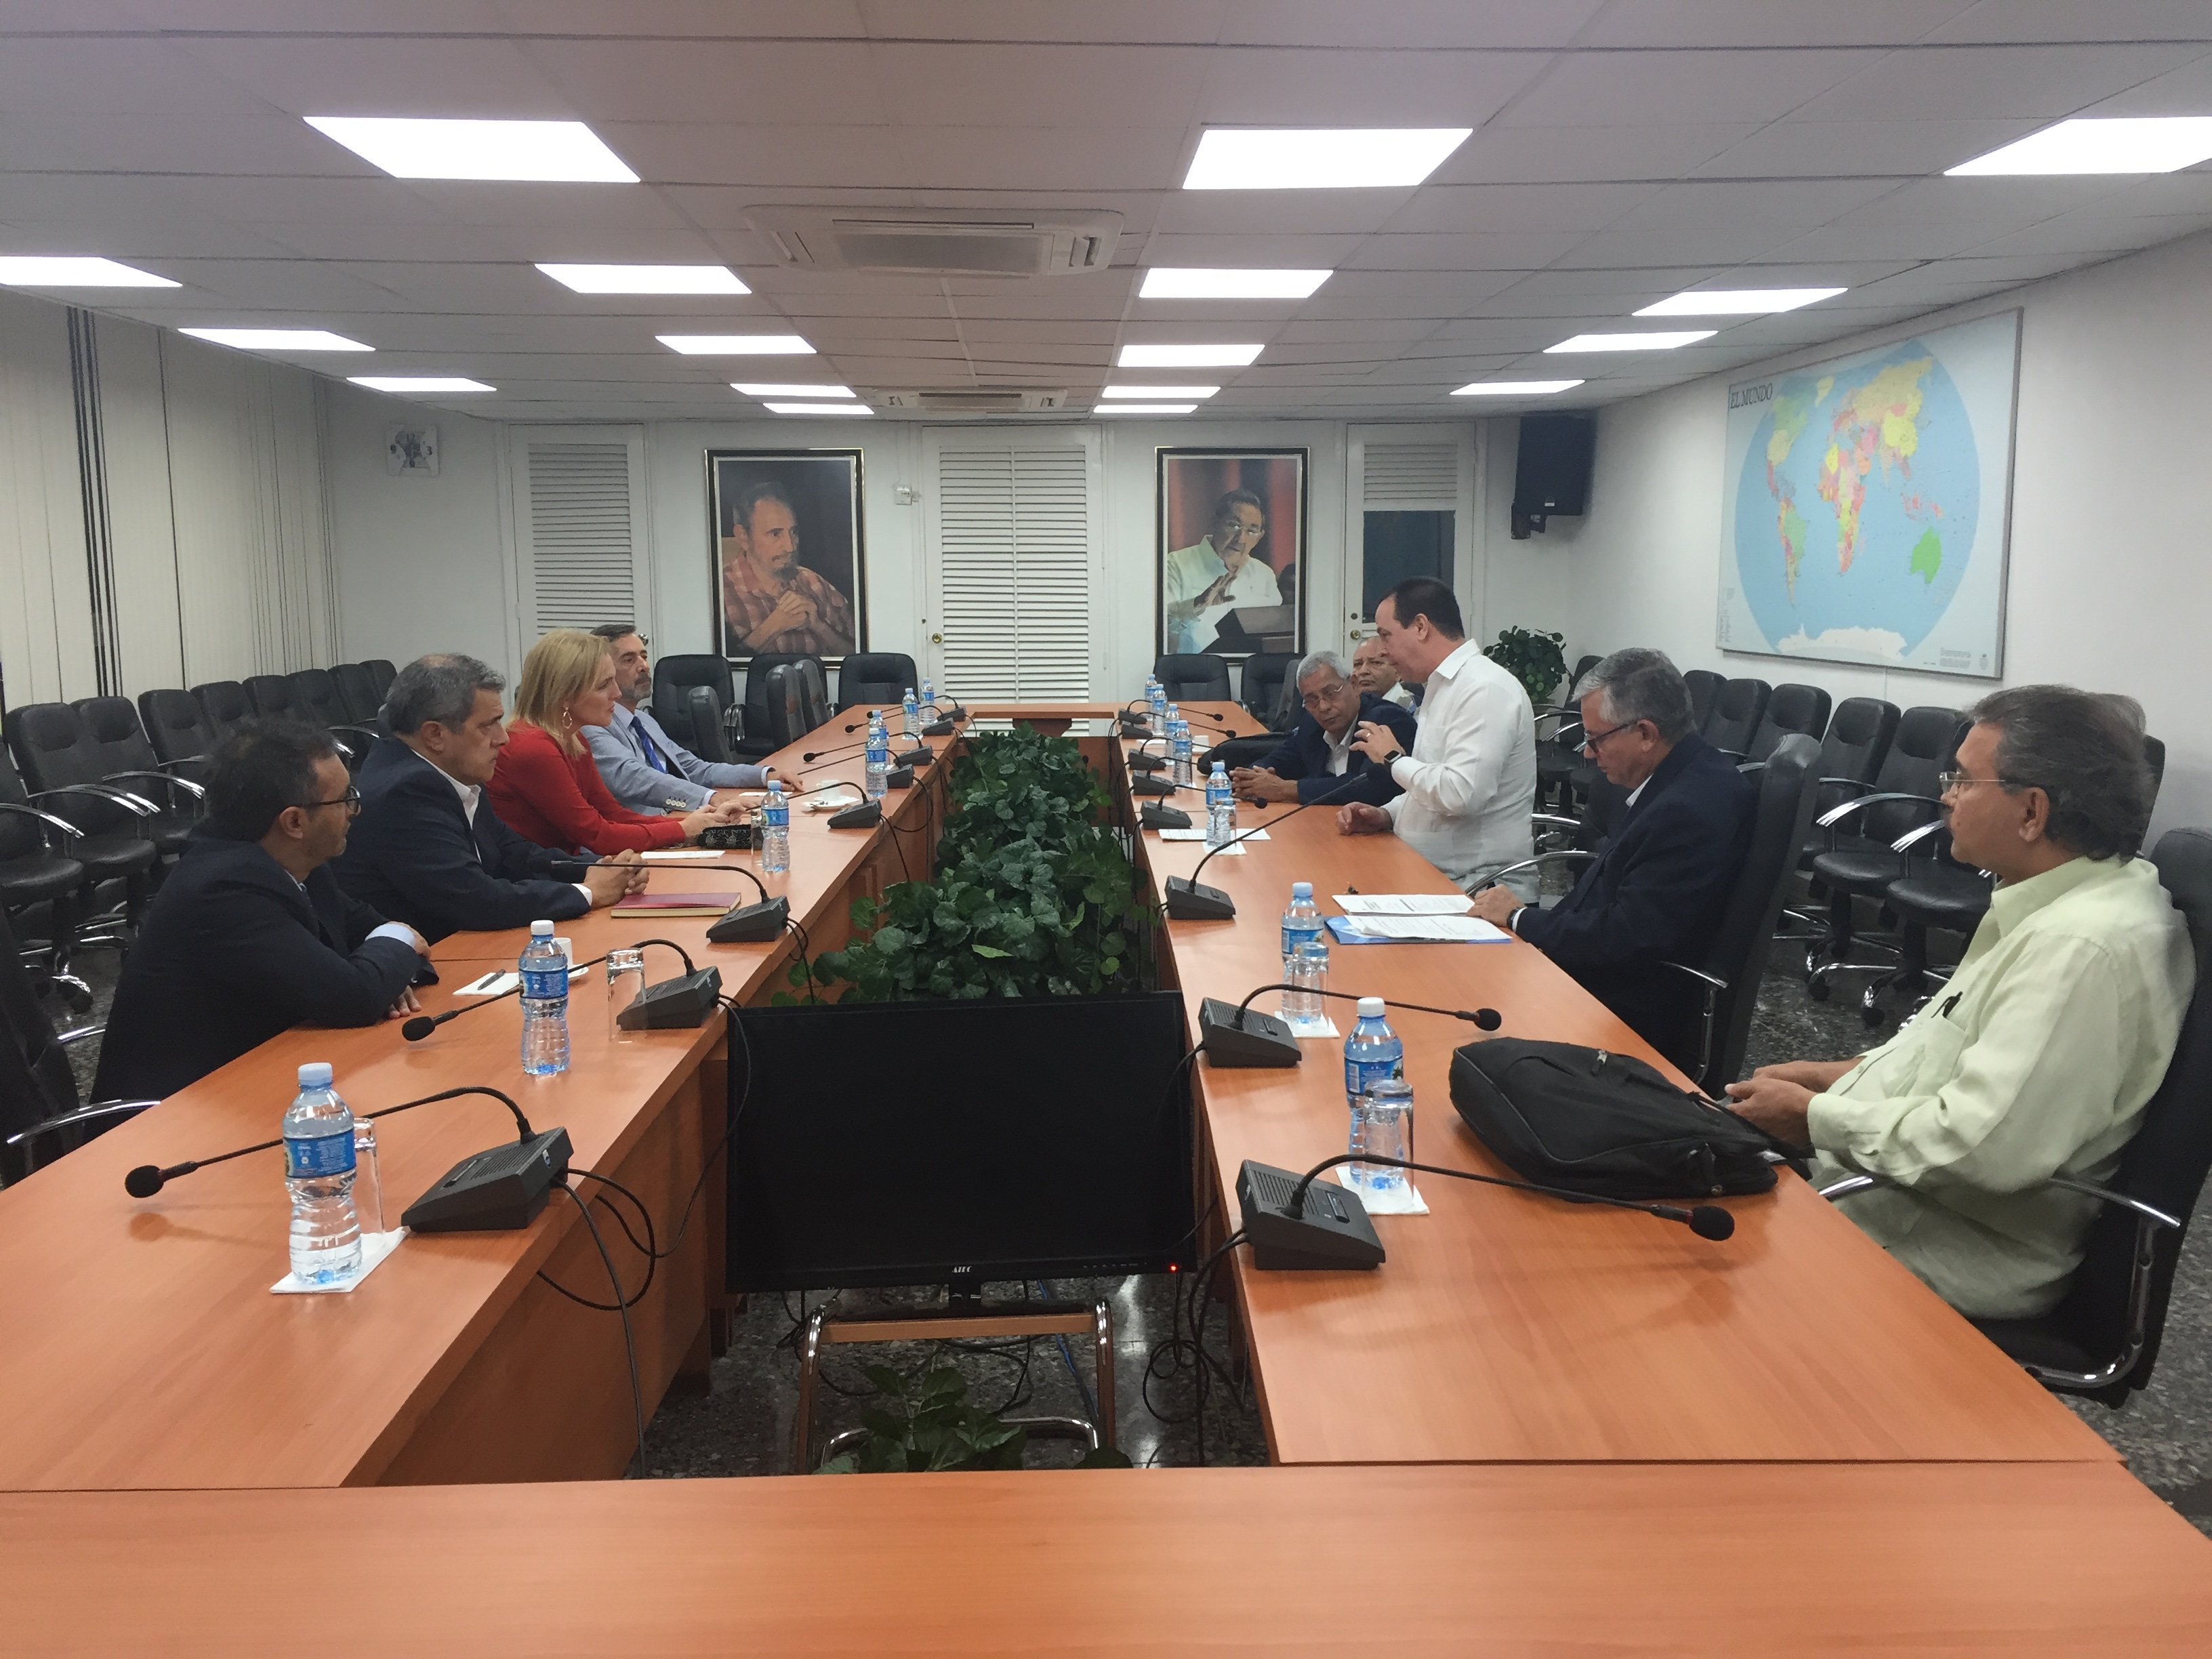 Cuba hosts World Organ, Tissue and Transplant Donation Day meeting